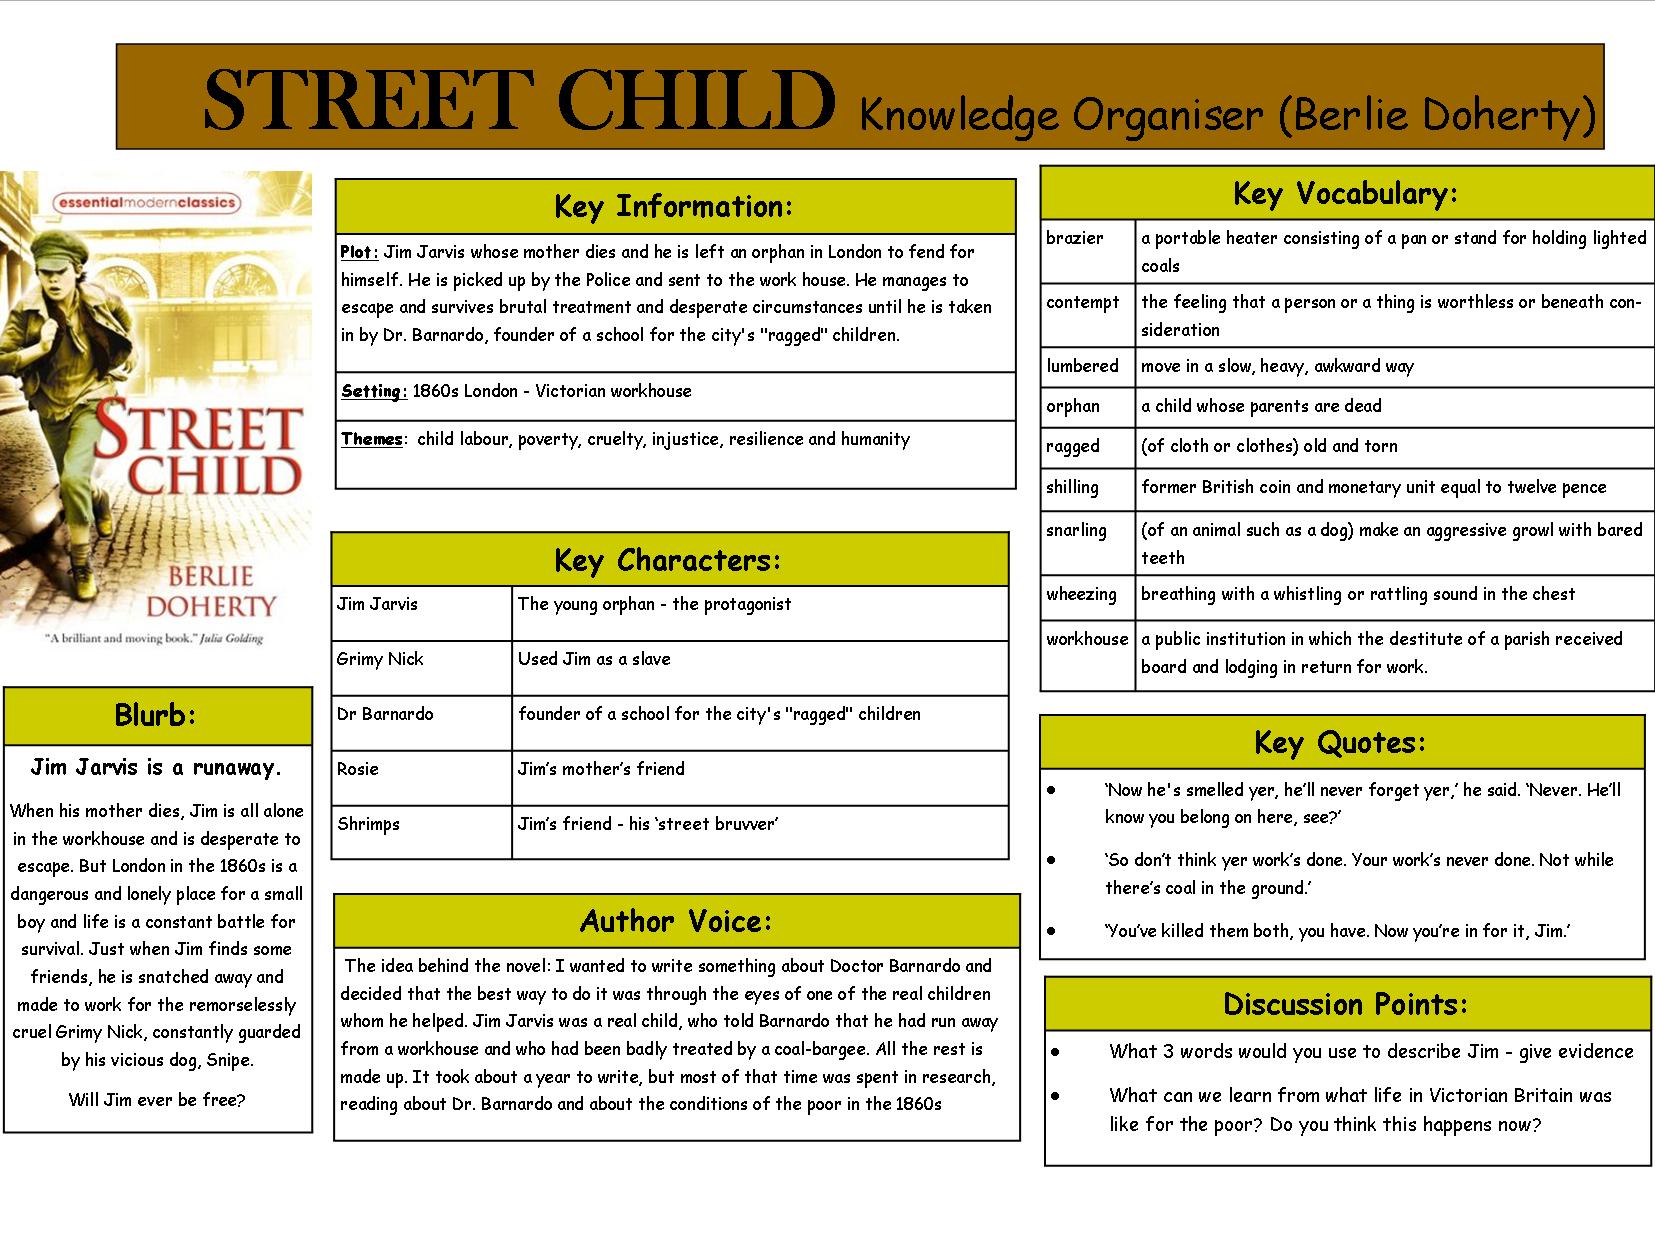 Street Child Knowledge Organiser